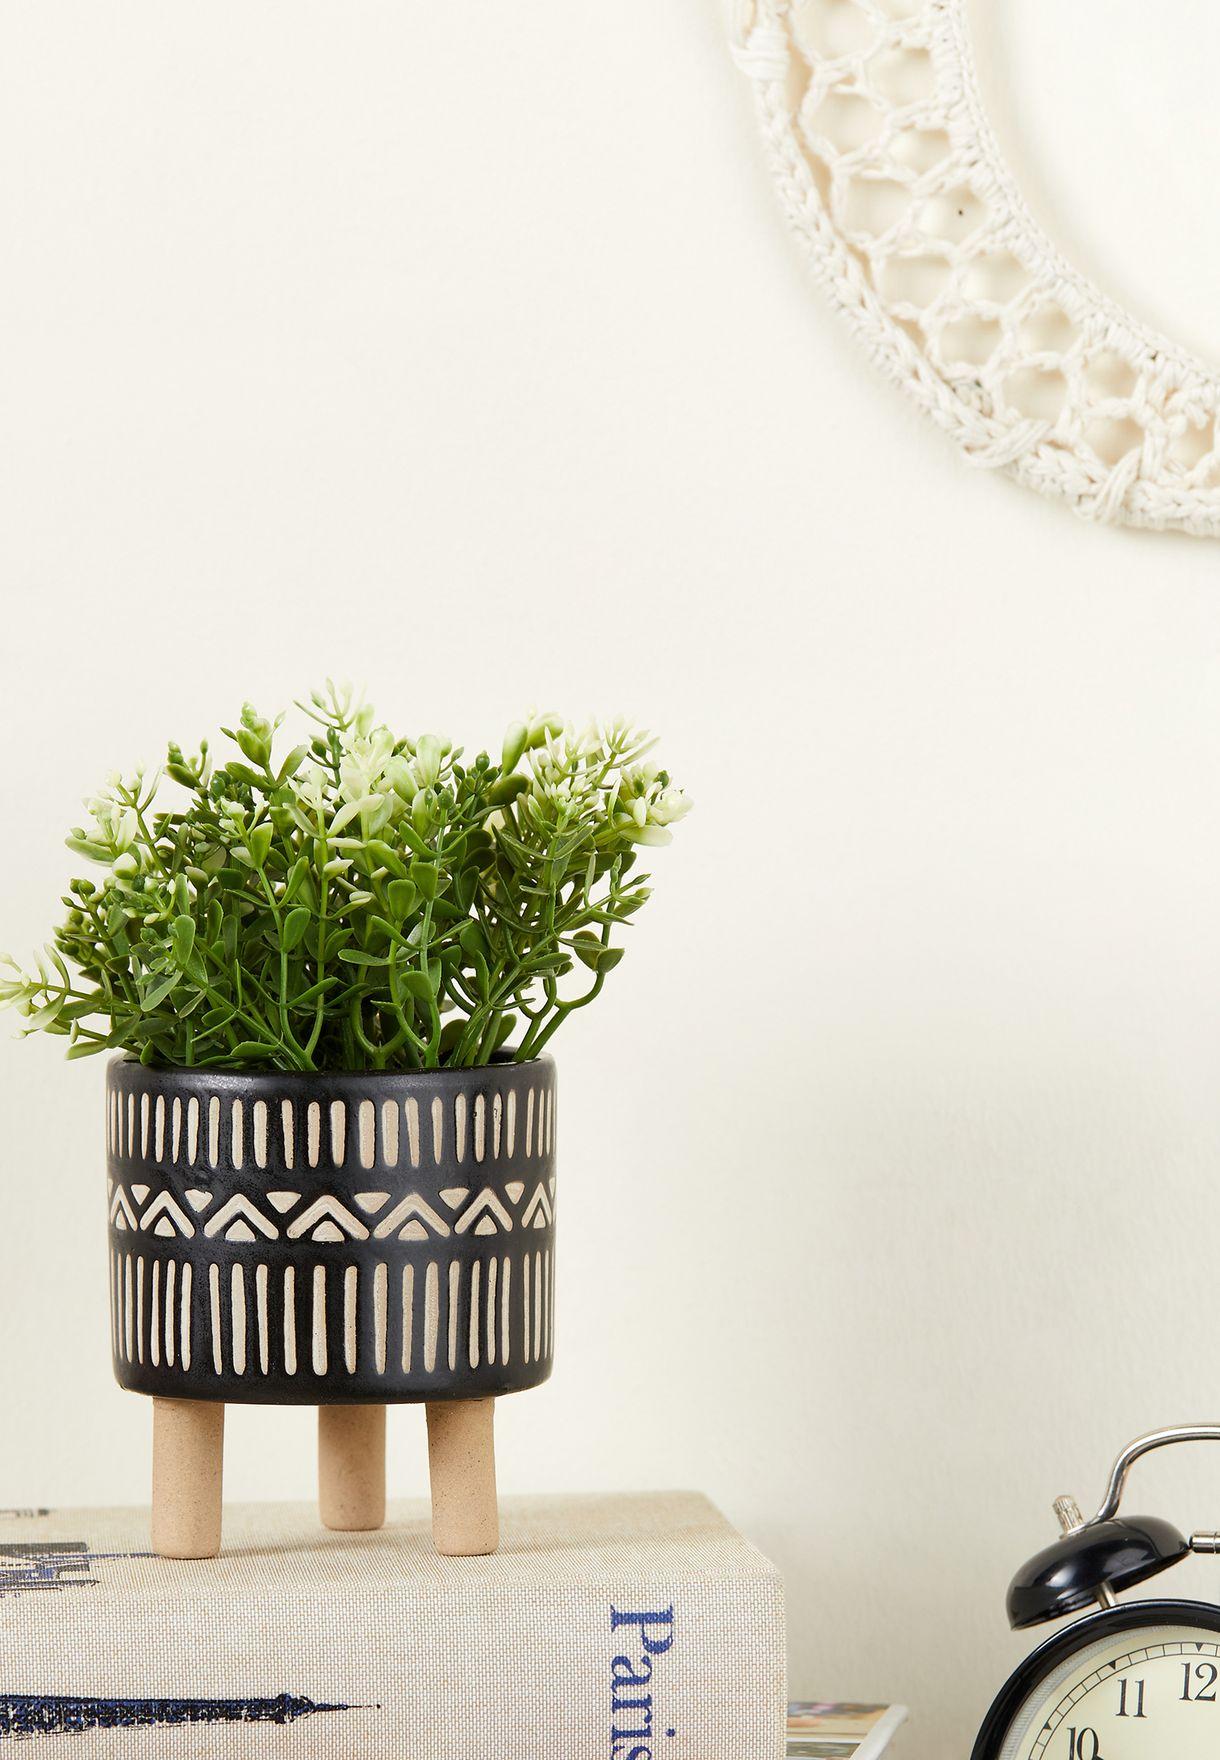 اصيص نباتات بوهيمي